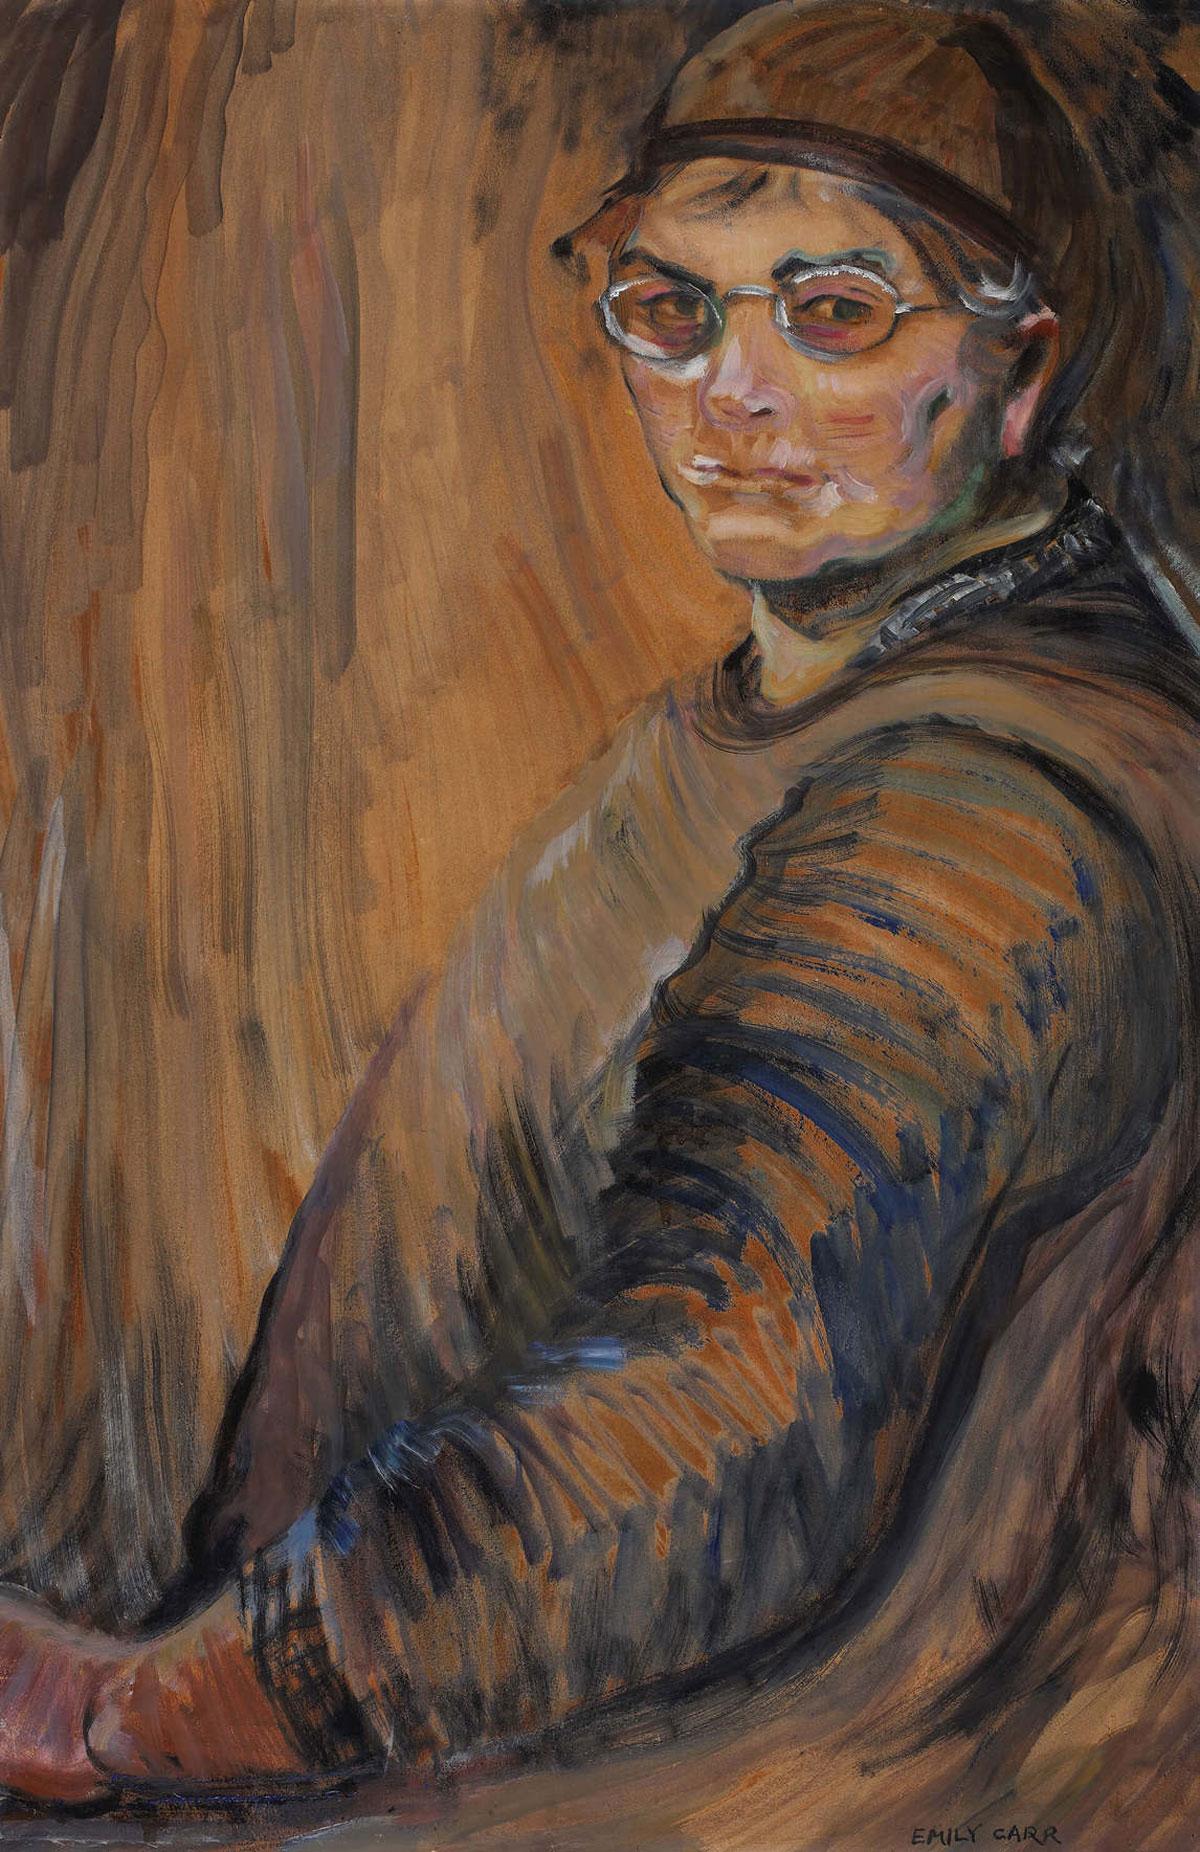 self-potrait by Emily Carr, 1938/1939